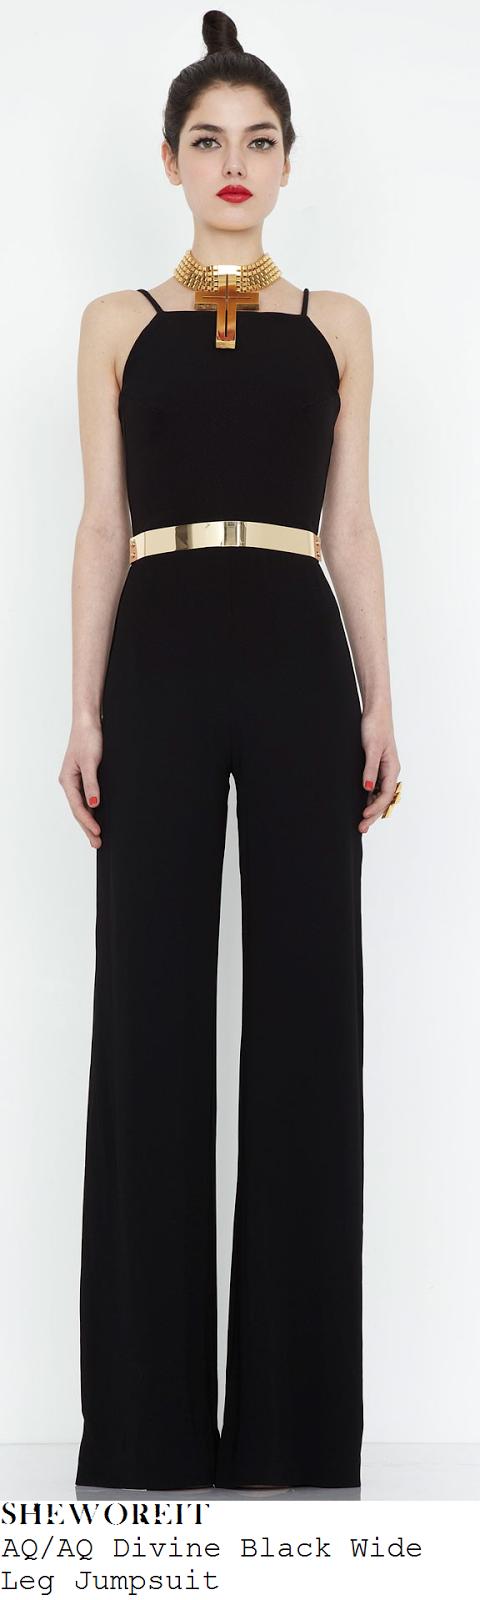 laura-whitmore-black-jumpsuit